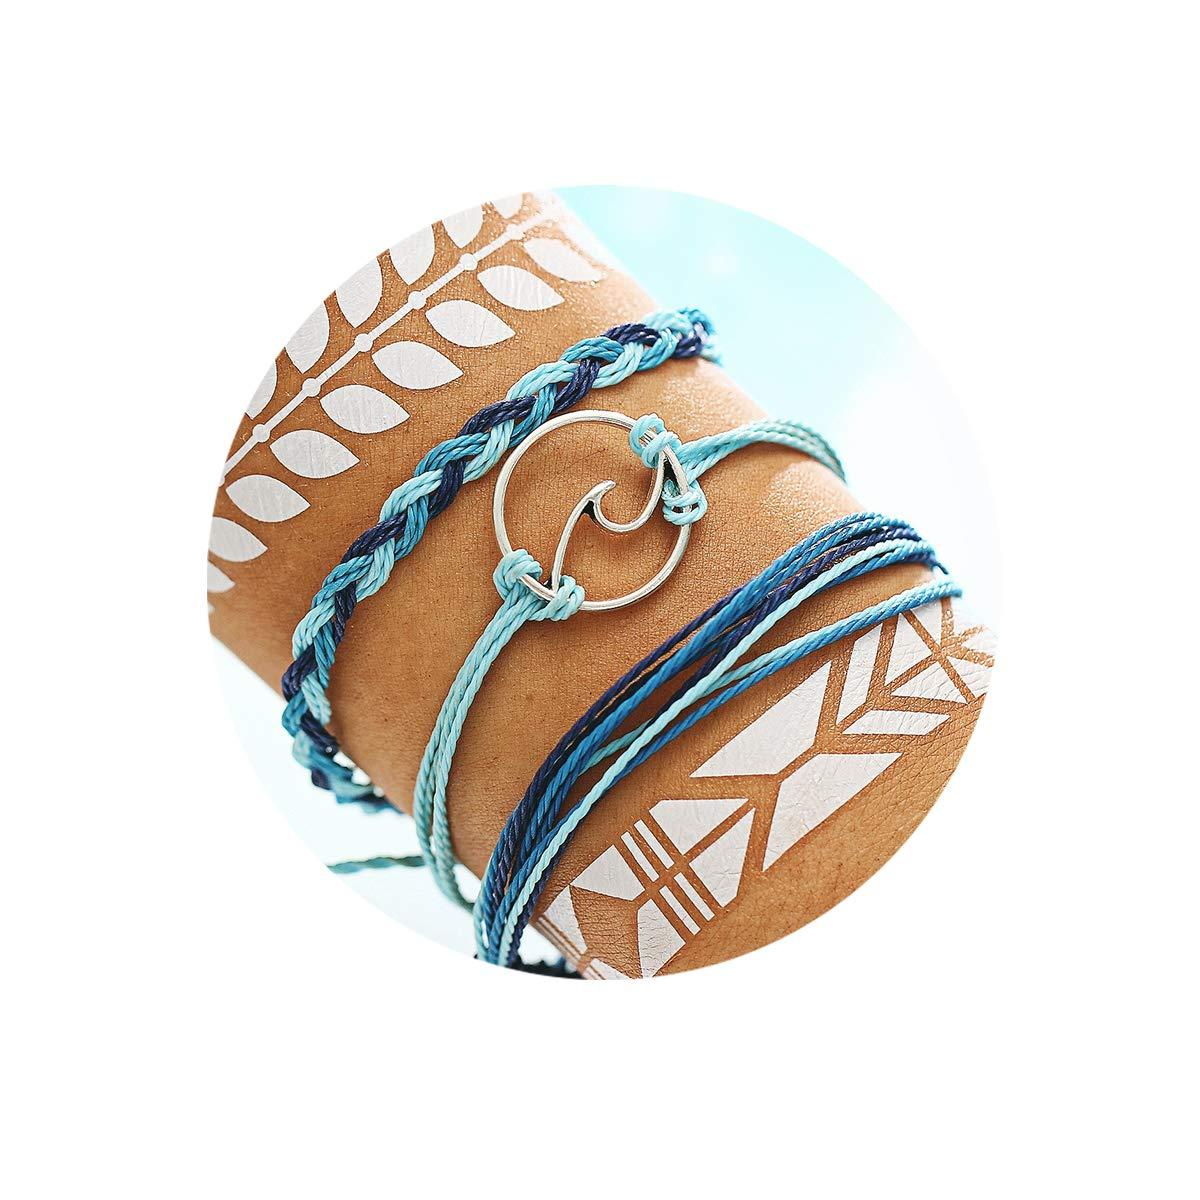 FINETOO Wave Strand Bracelet Set Handmade Waterproof Wax Coated Braided Rope Boho Woven Bracelet Women